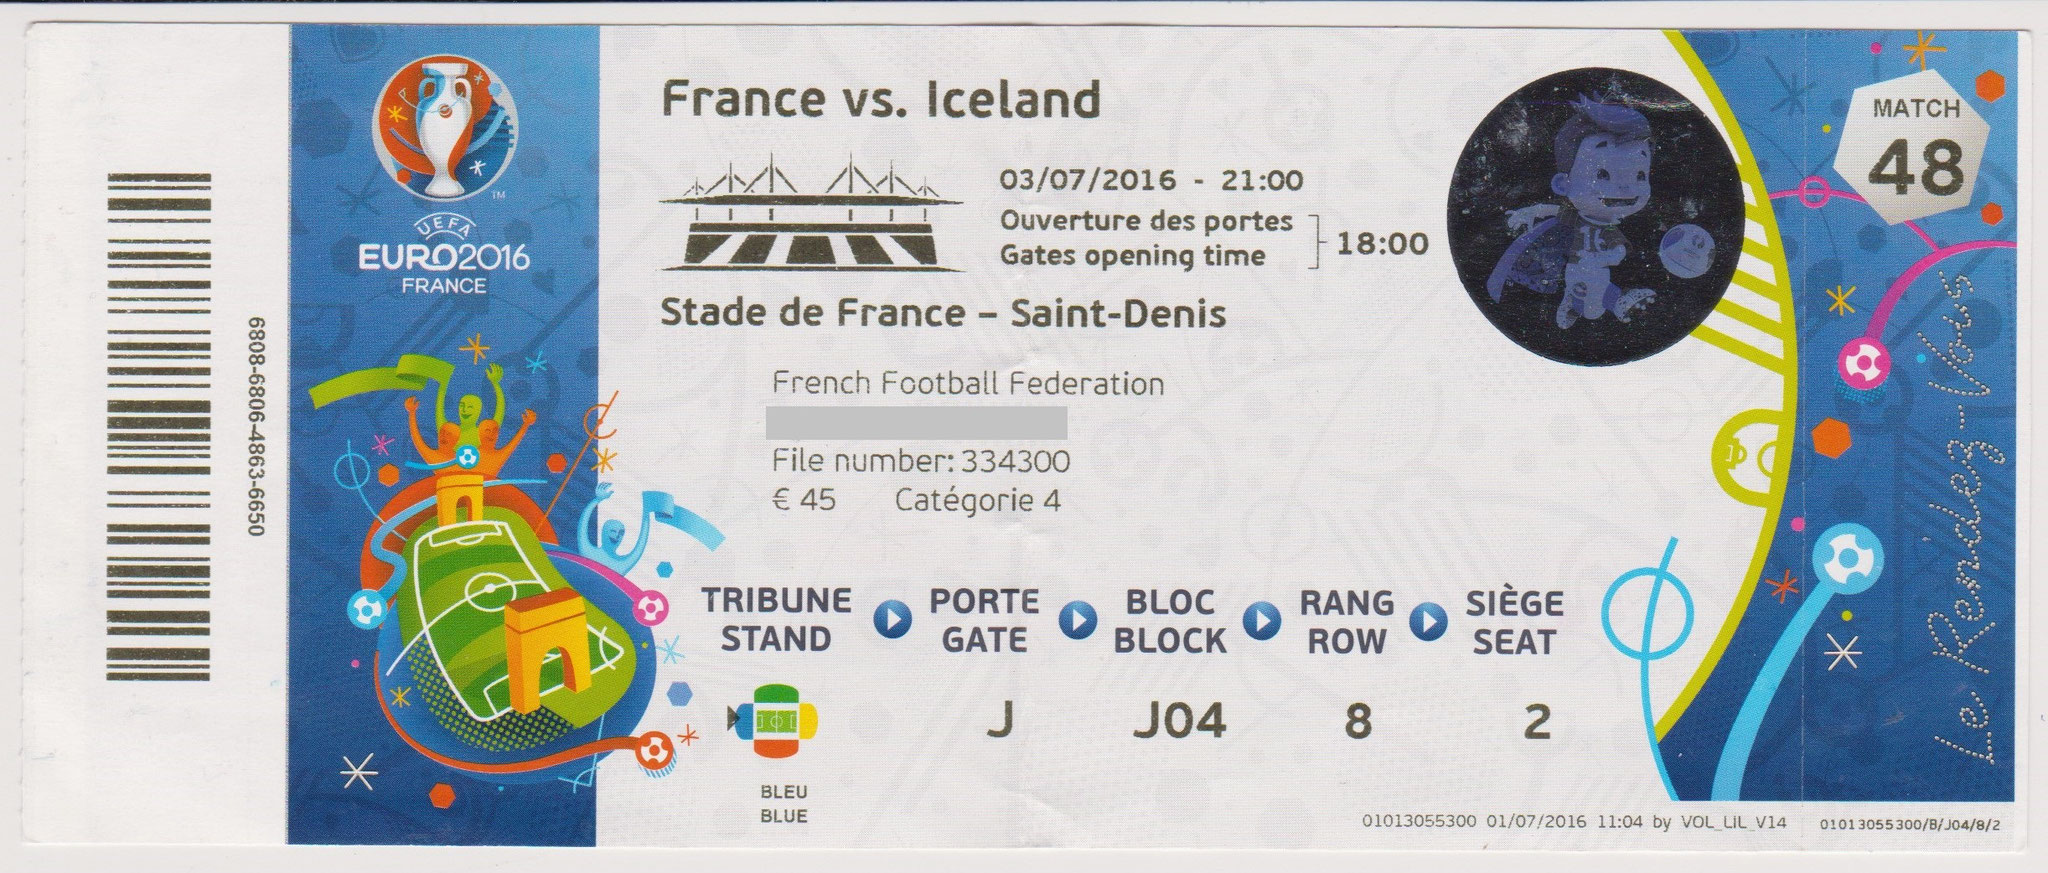 03/07/2016 St Denis :  1/4 Fin France  5 - 2  Islande  > Giroud x 2, Pogba, Payet, Griezmann  (Fra) -- Sigthórsson, B. Bjarnason  (Isl)  <